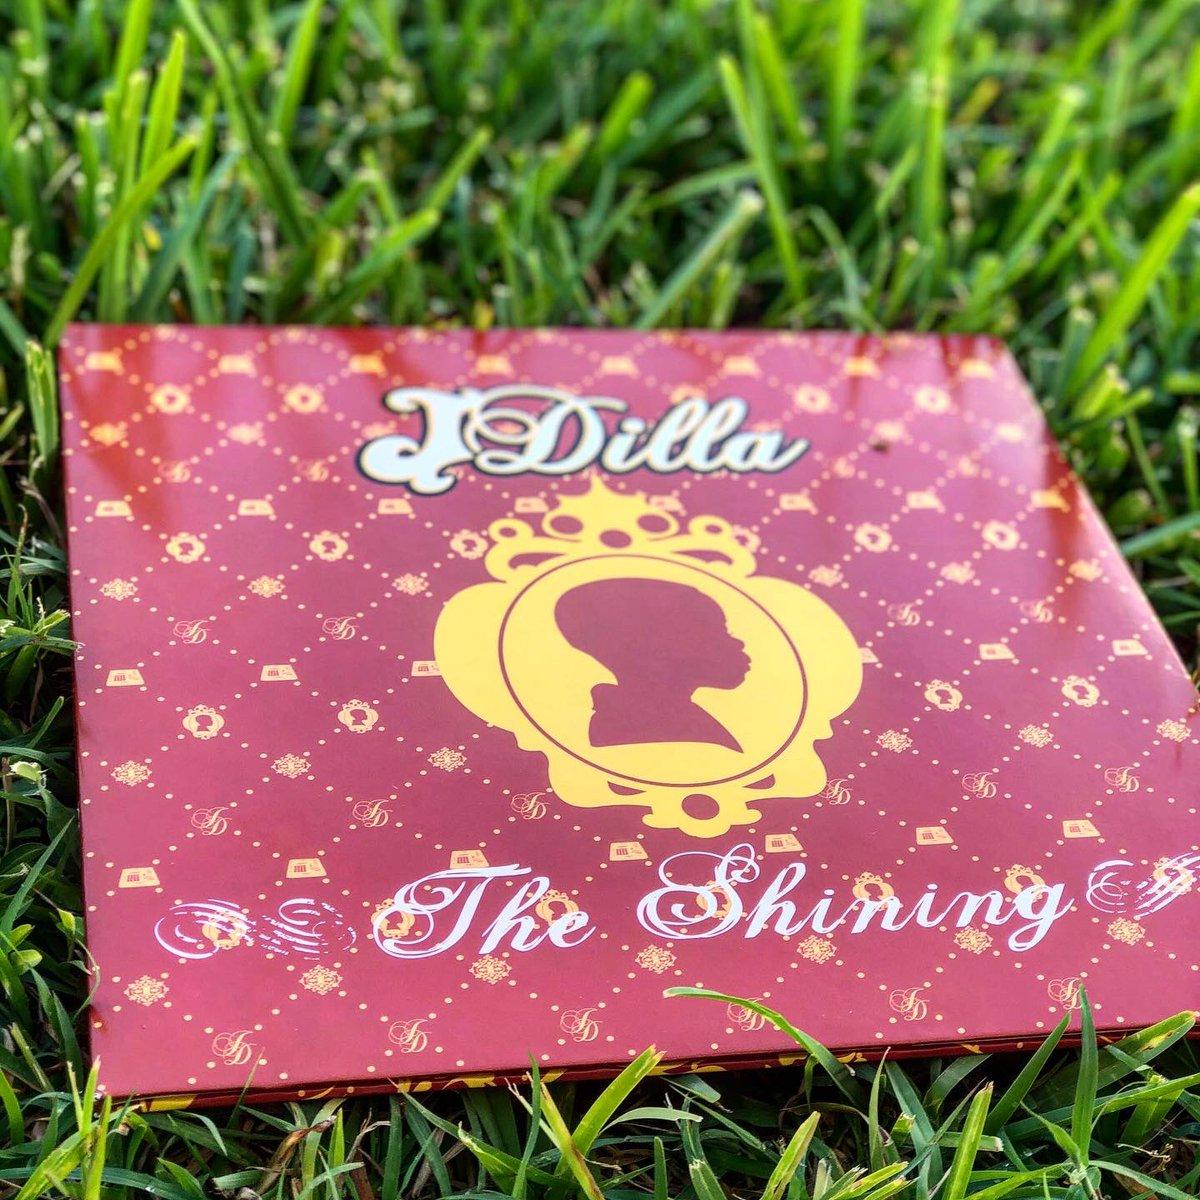 J Dilla - The Shining (2006)  Favorite track: So Far To Go  Rest In Peace J Dilla  #theneedyl #vibrations #vinylcollection #vinyl #vinylrecords #musicislife #jdilla #ripjdilla #jaydee #theshining #soulquarianspic.twitter.com/yn0lgB8PAh